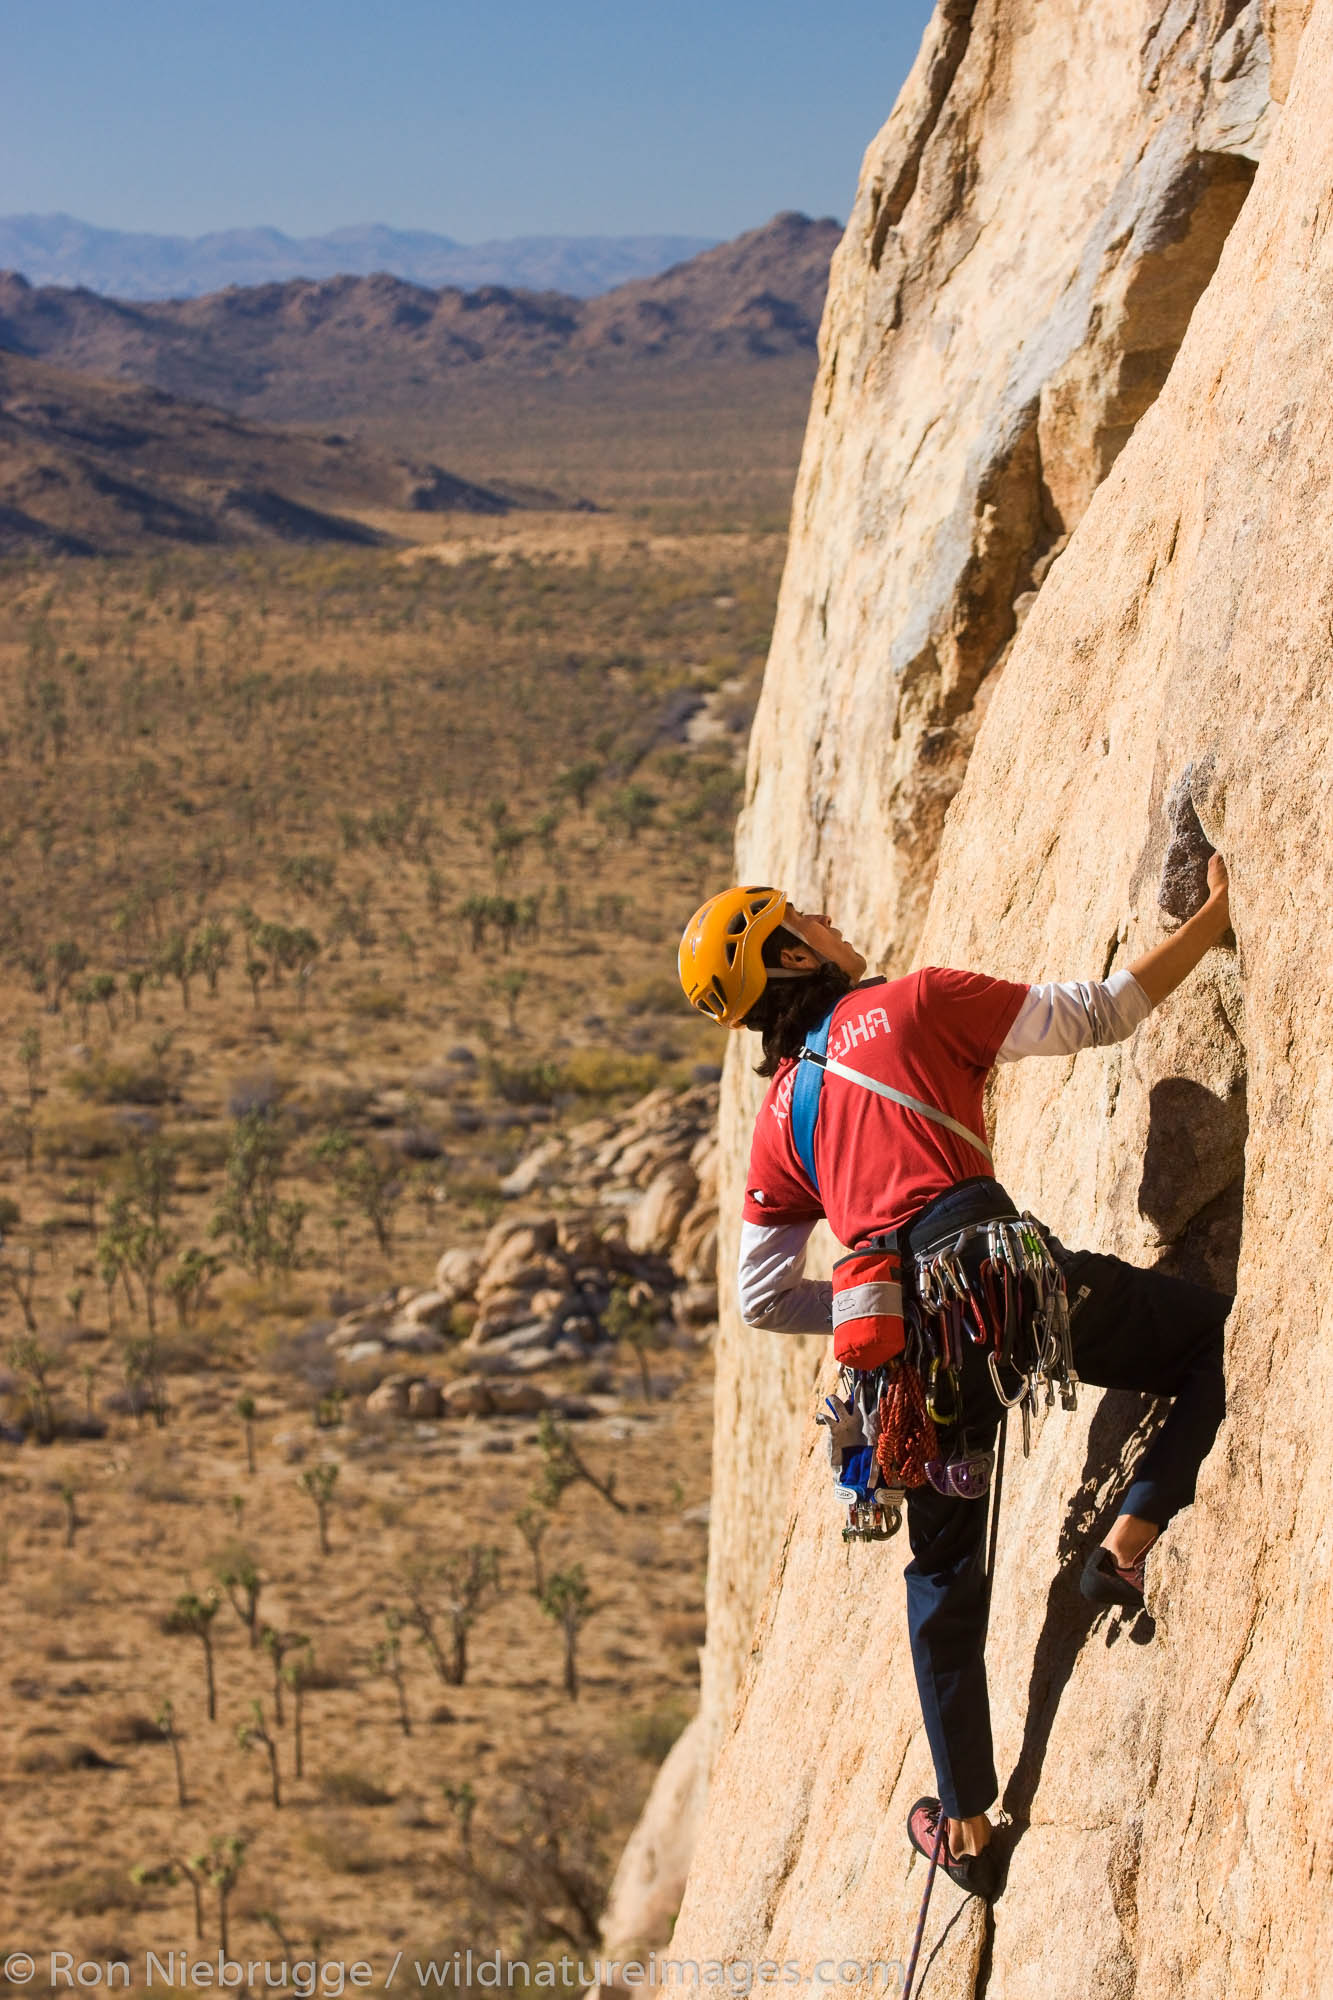 Ernest Sierras rock climbing in Joshua Tree National Park, California.  (model released)